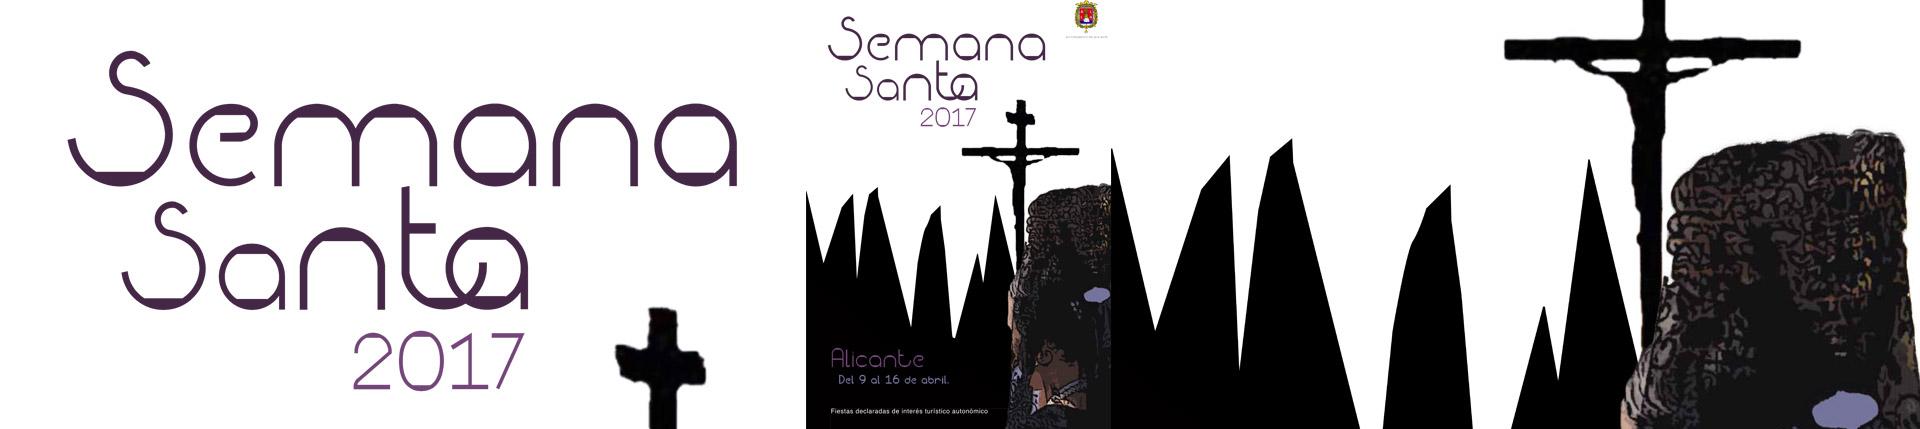 Semana Santa Alicante 2017